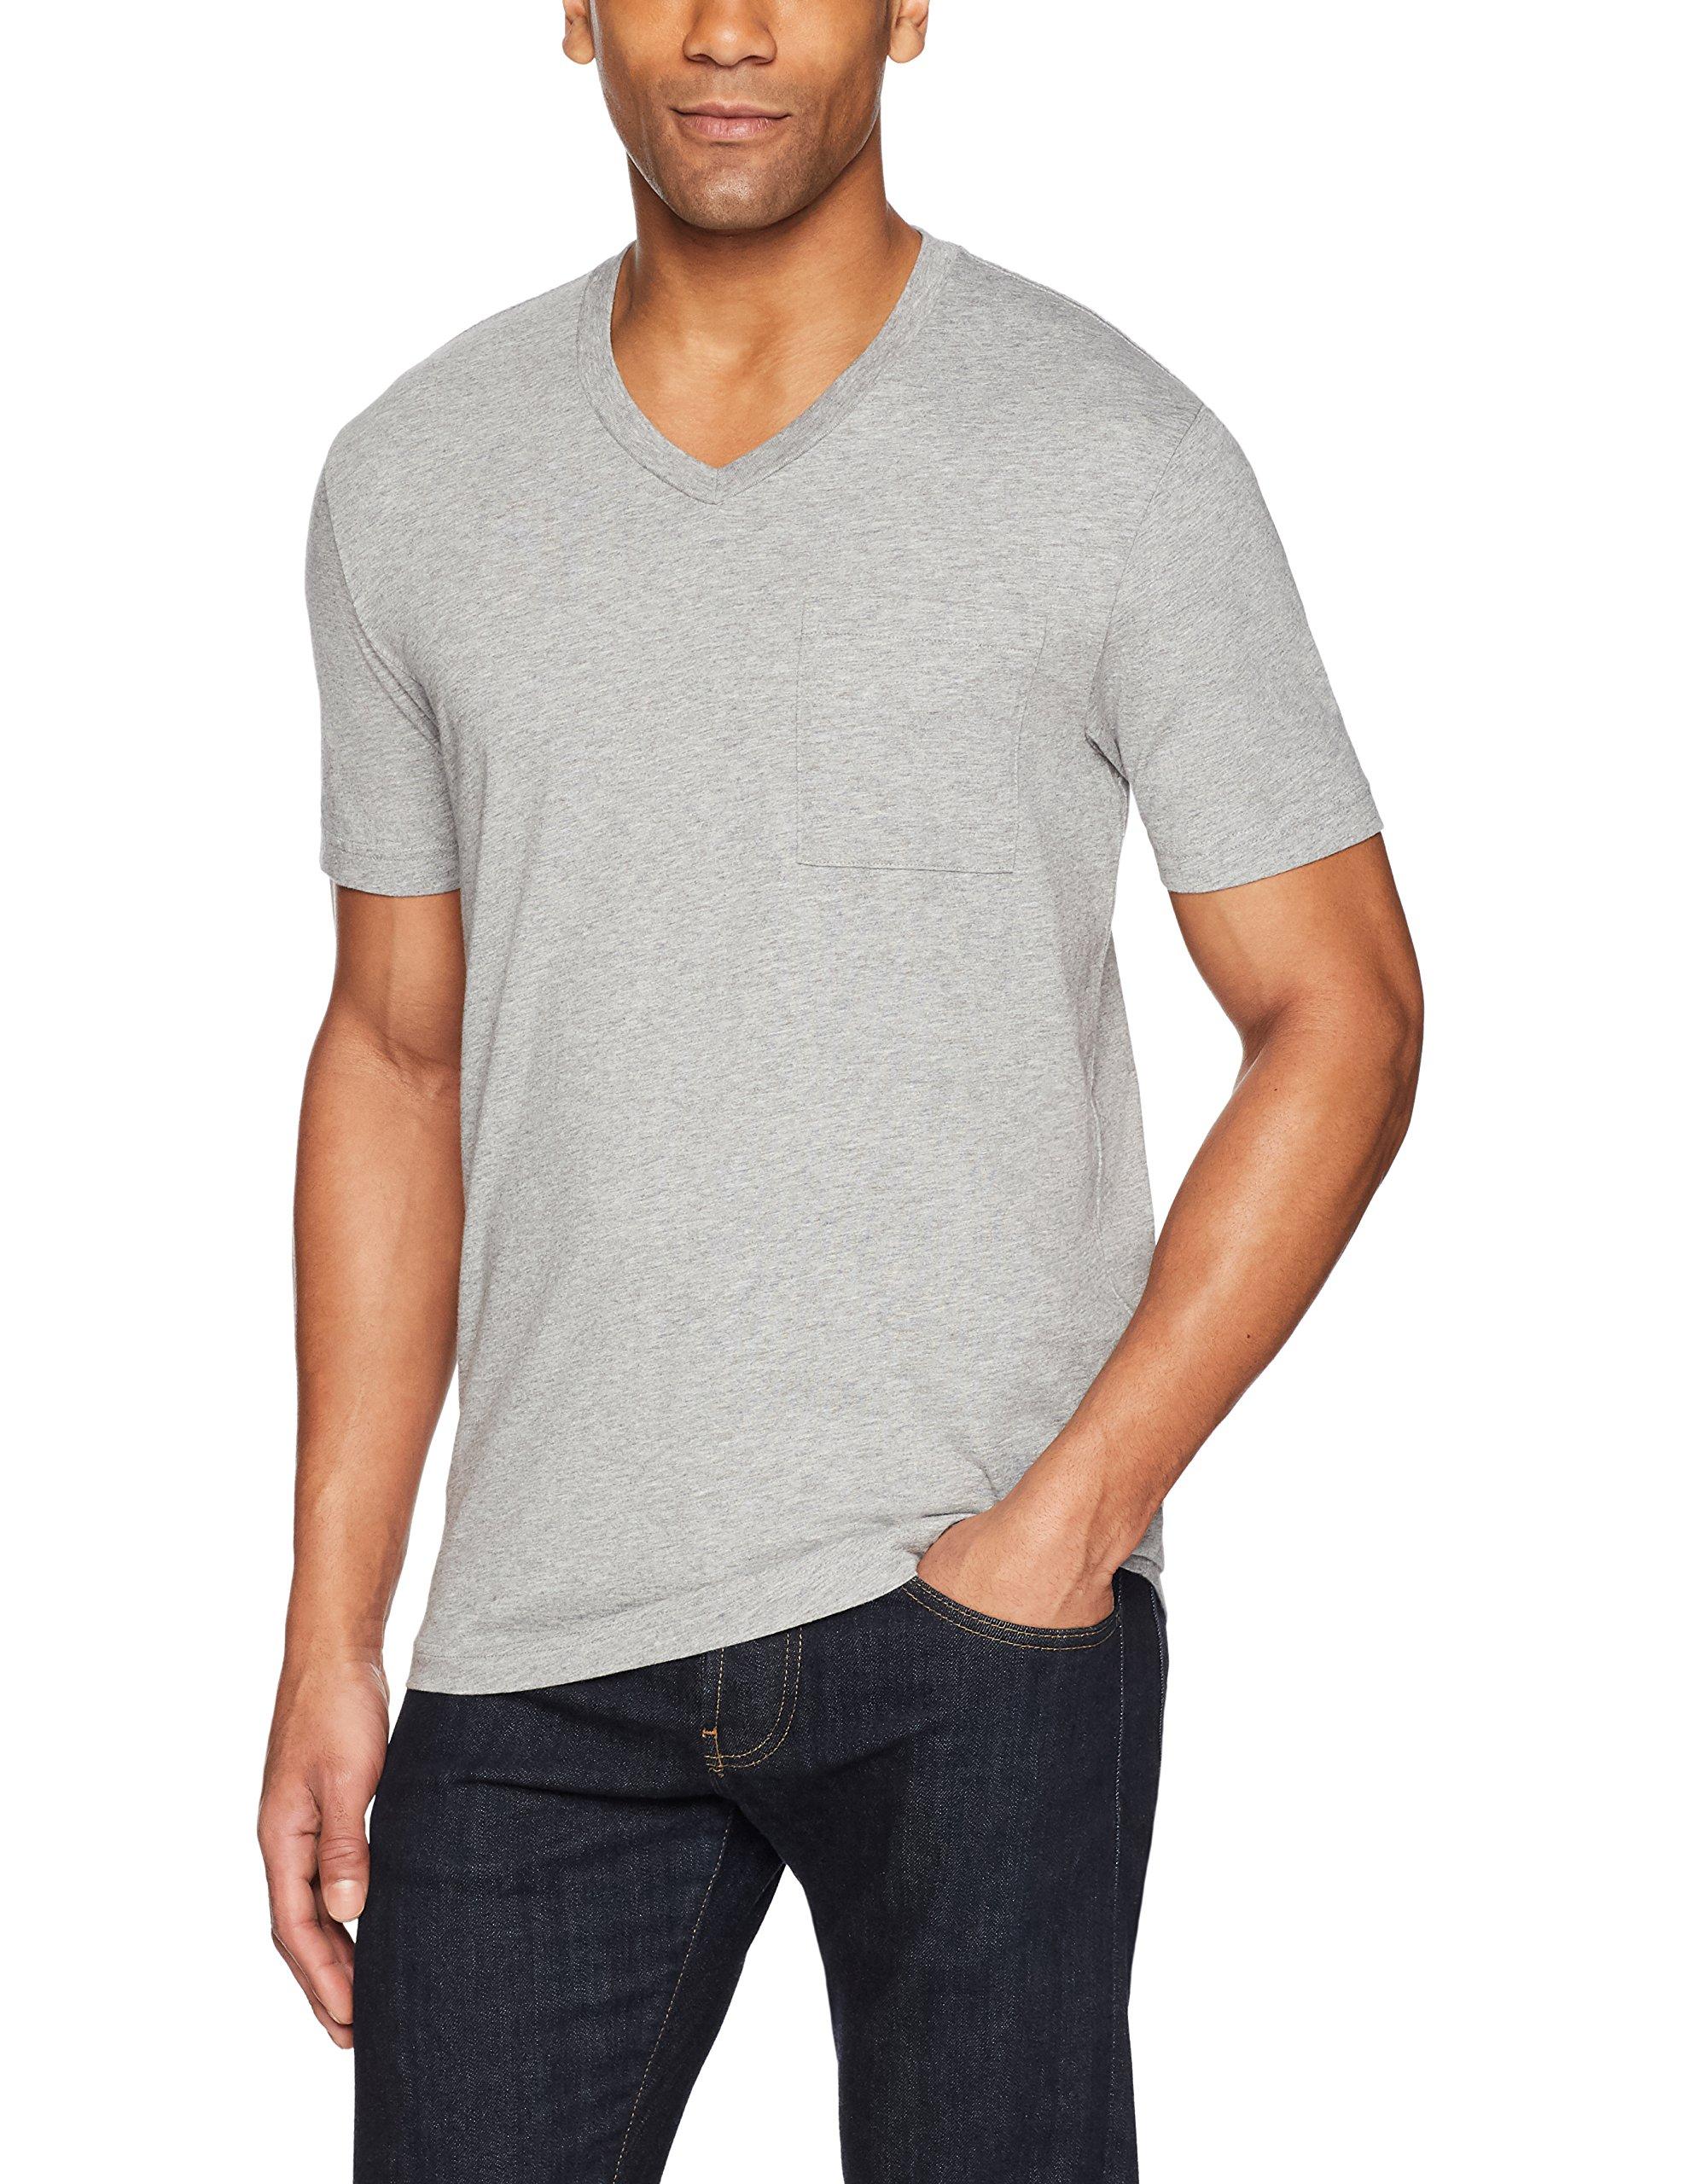 Goodthreads Men's Short-Sleeve V-Neck Cotton T-Shirt, Heather Grey, X-Large by Goodthreads (Image #3)